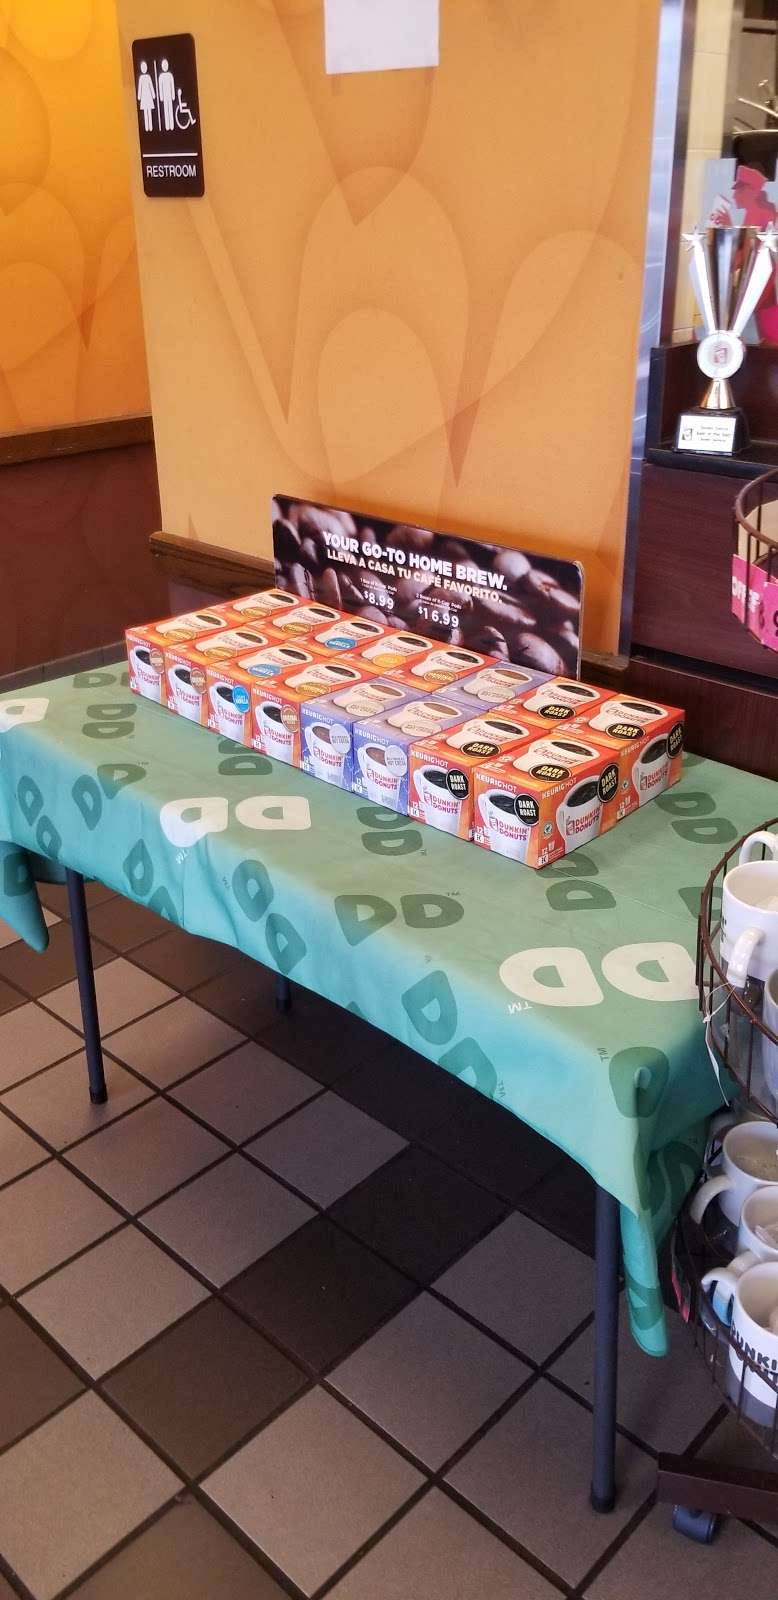 Dunkin Donuts - cafe    Photo 9 of 10   Address: 410 Lalor St, Trenton, NJ 08611, USA   Phone: (609) 394-0855